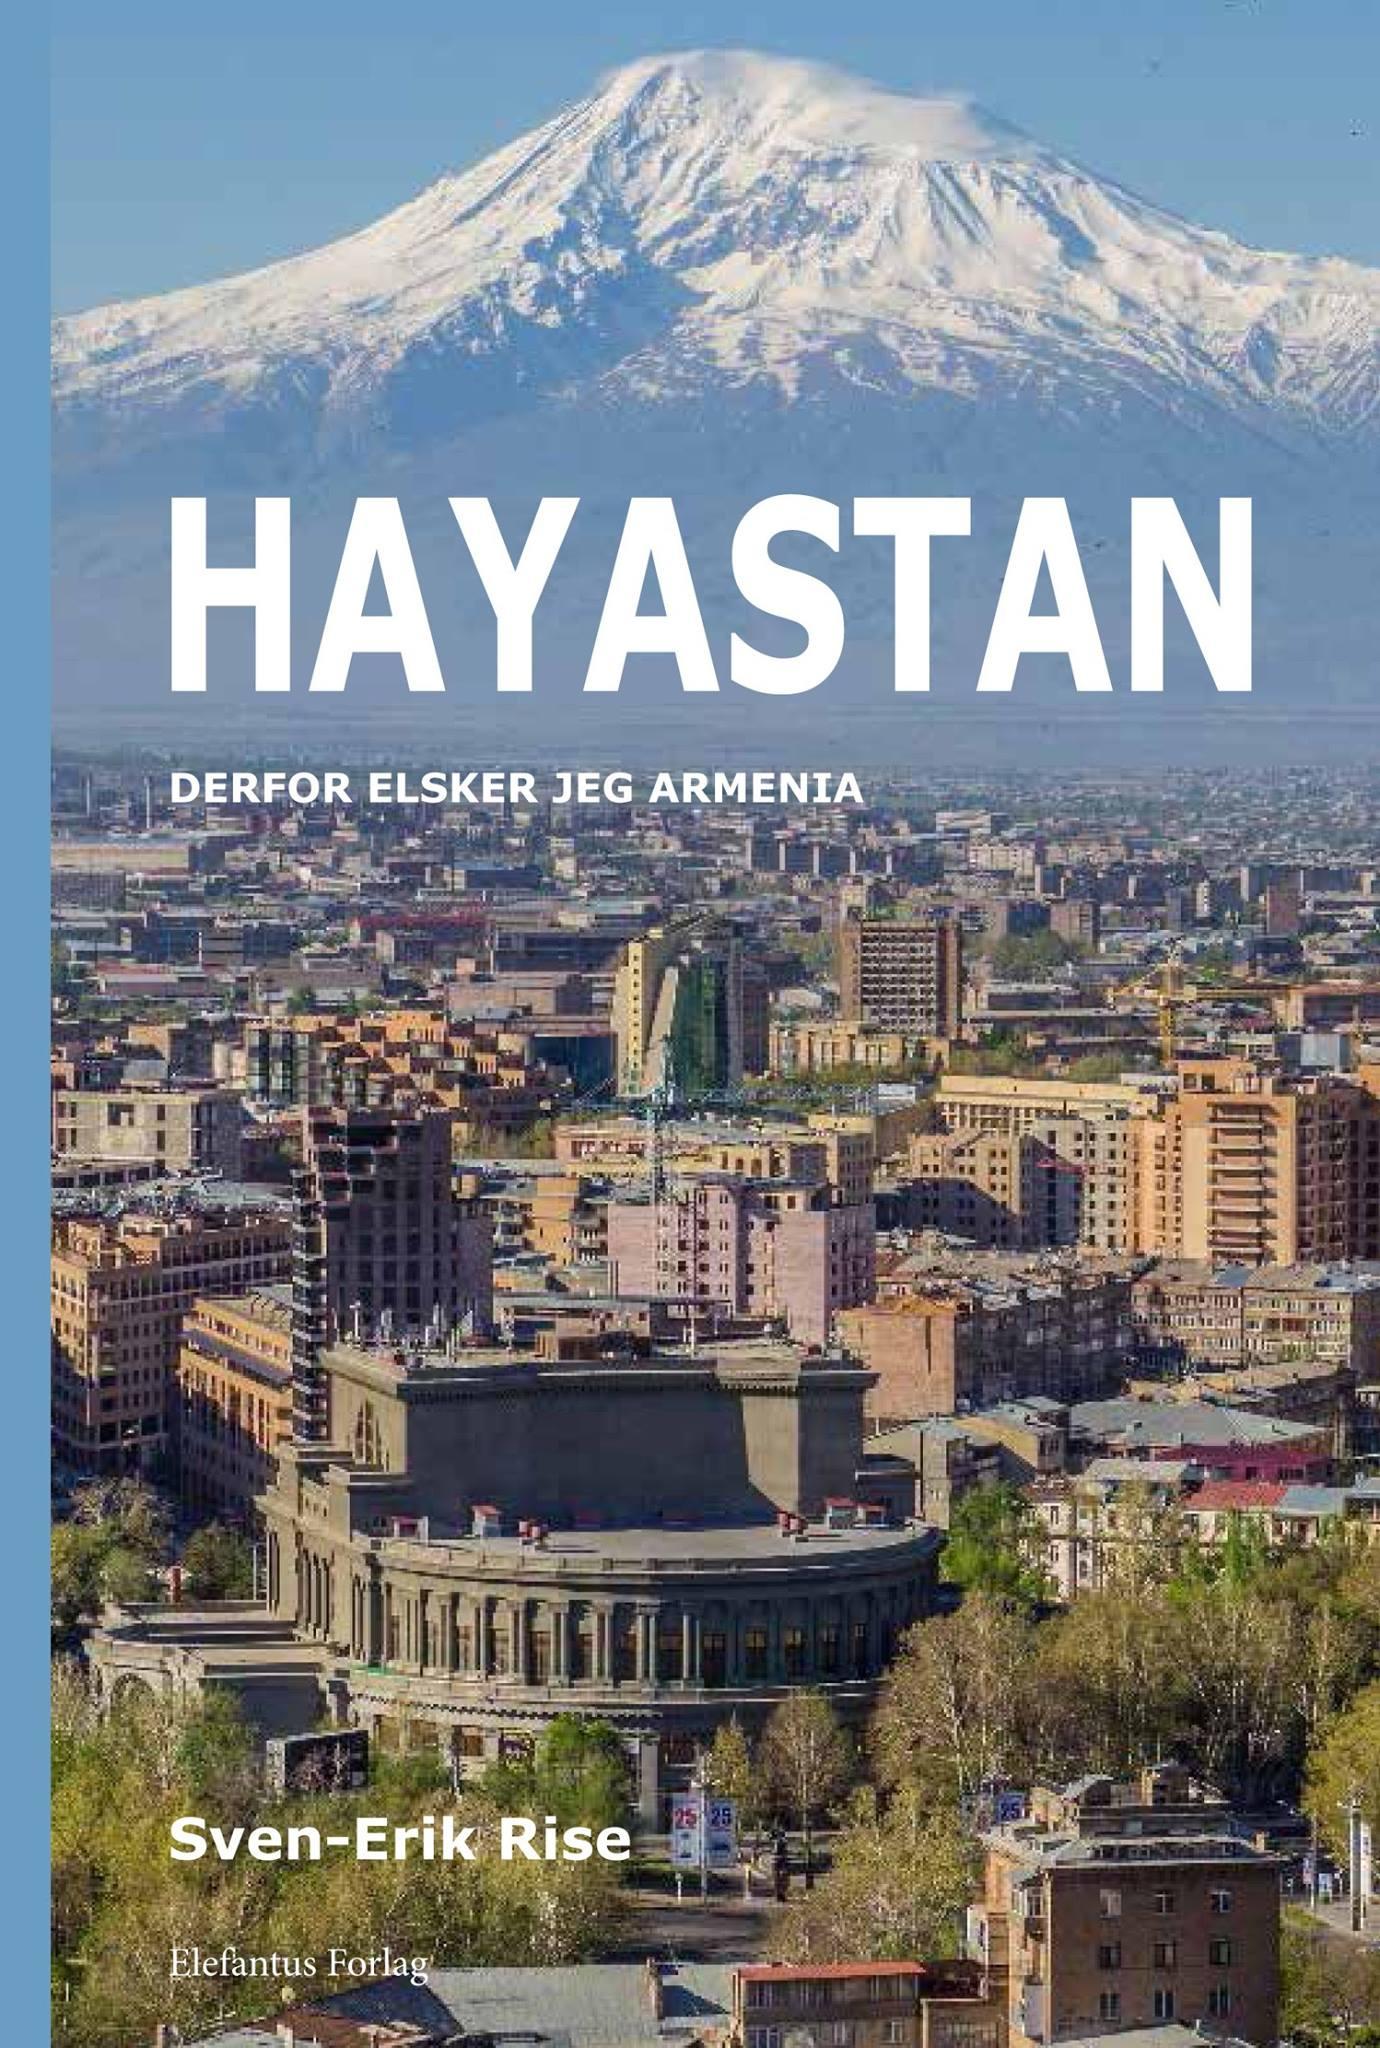 http://folkemordet1915.no/wp-content/uploads/2015/02/hayastan1.jpg